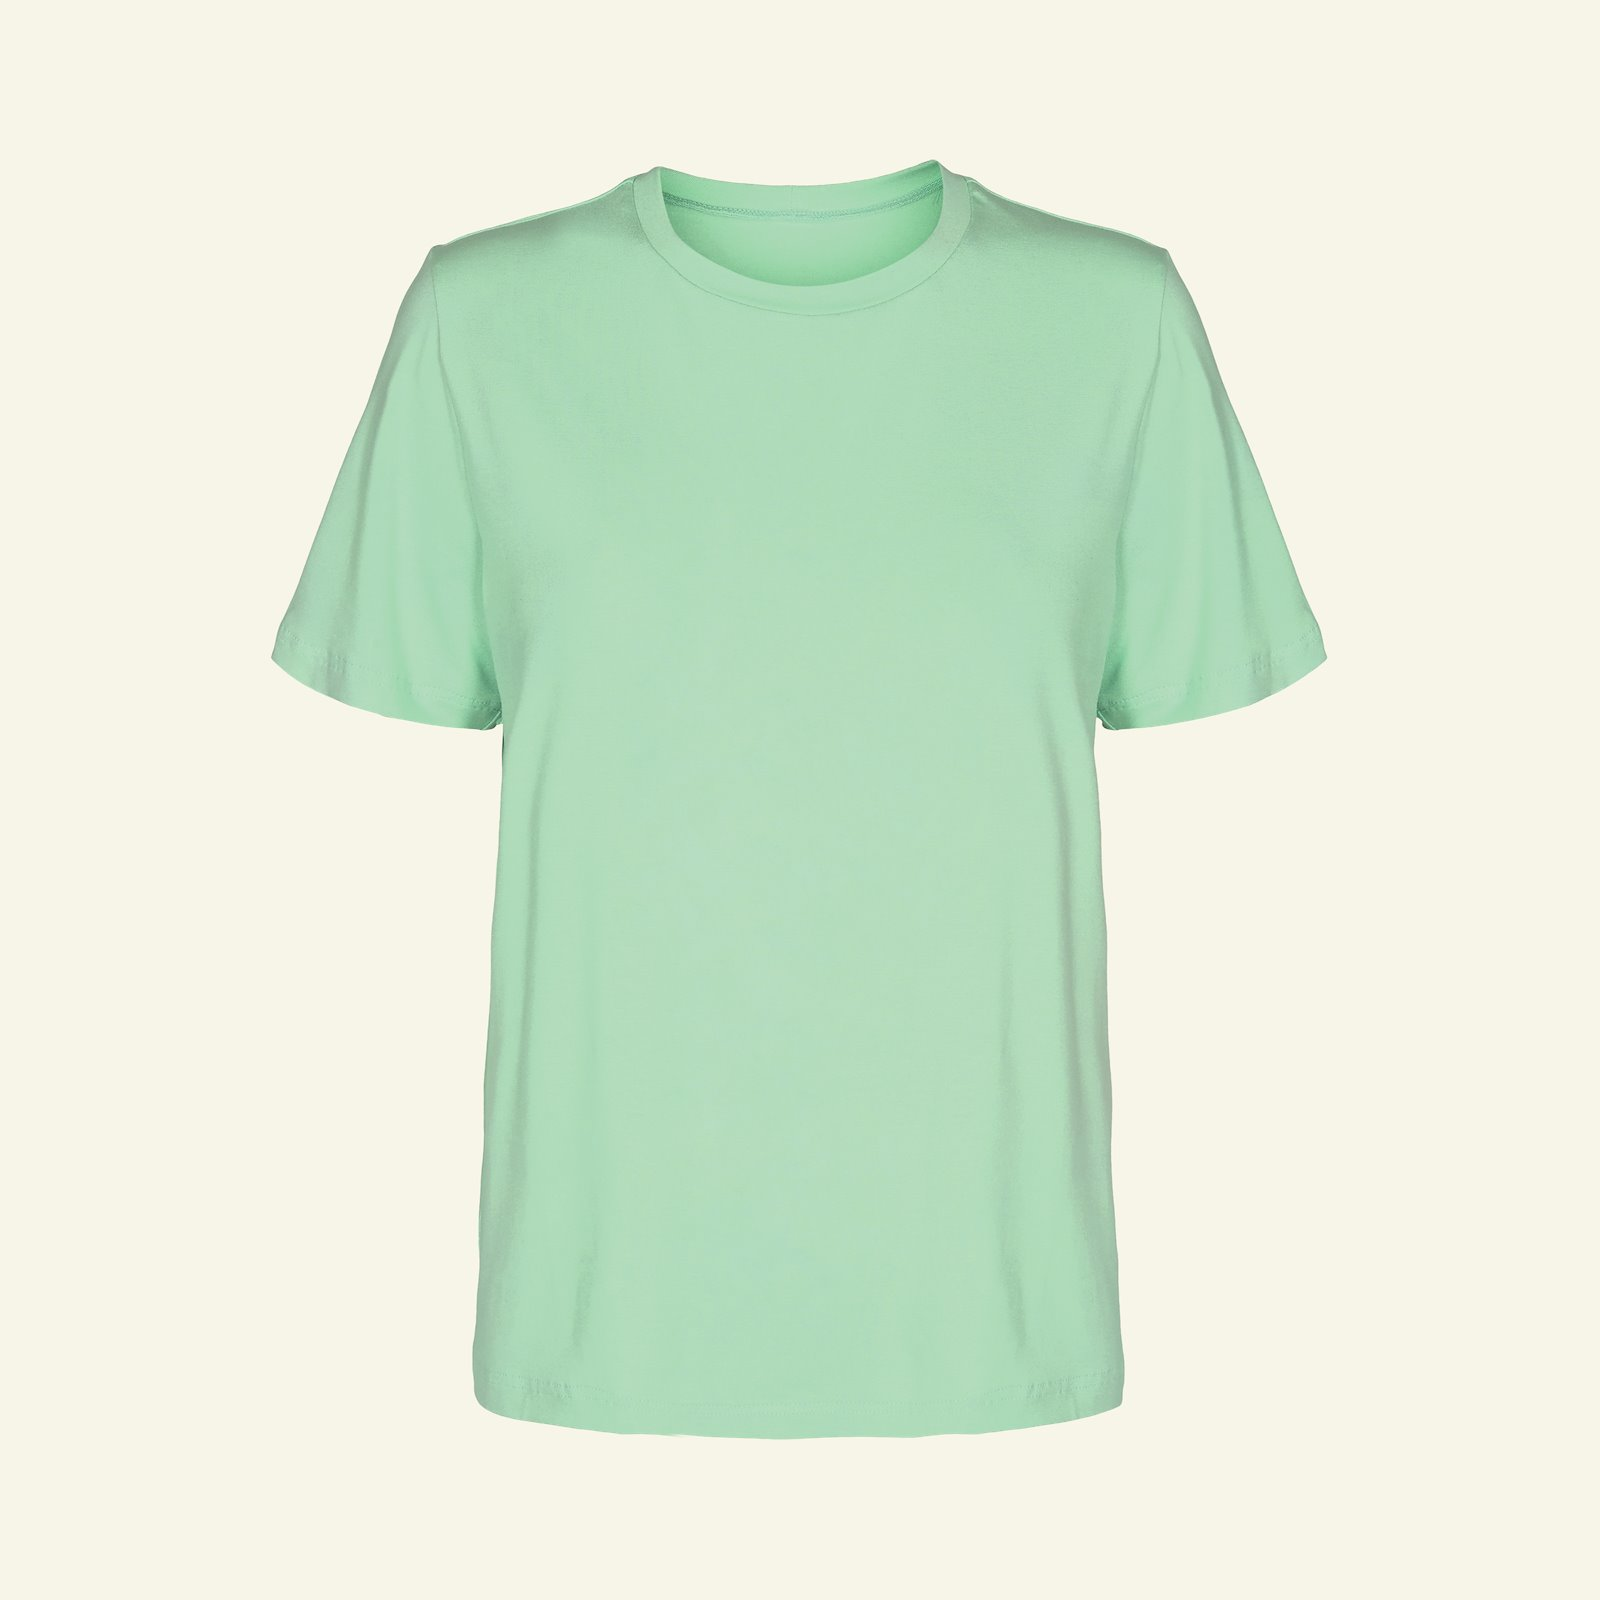 T-shirt and dress, 44/16 p22070_272660_sskit